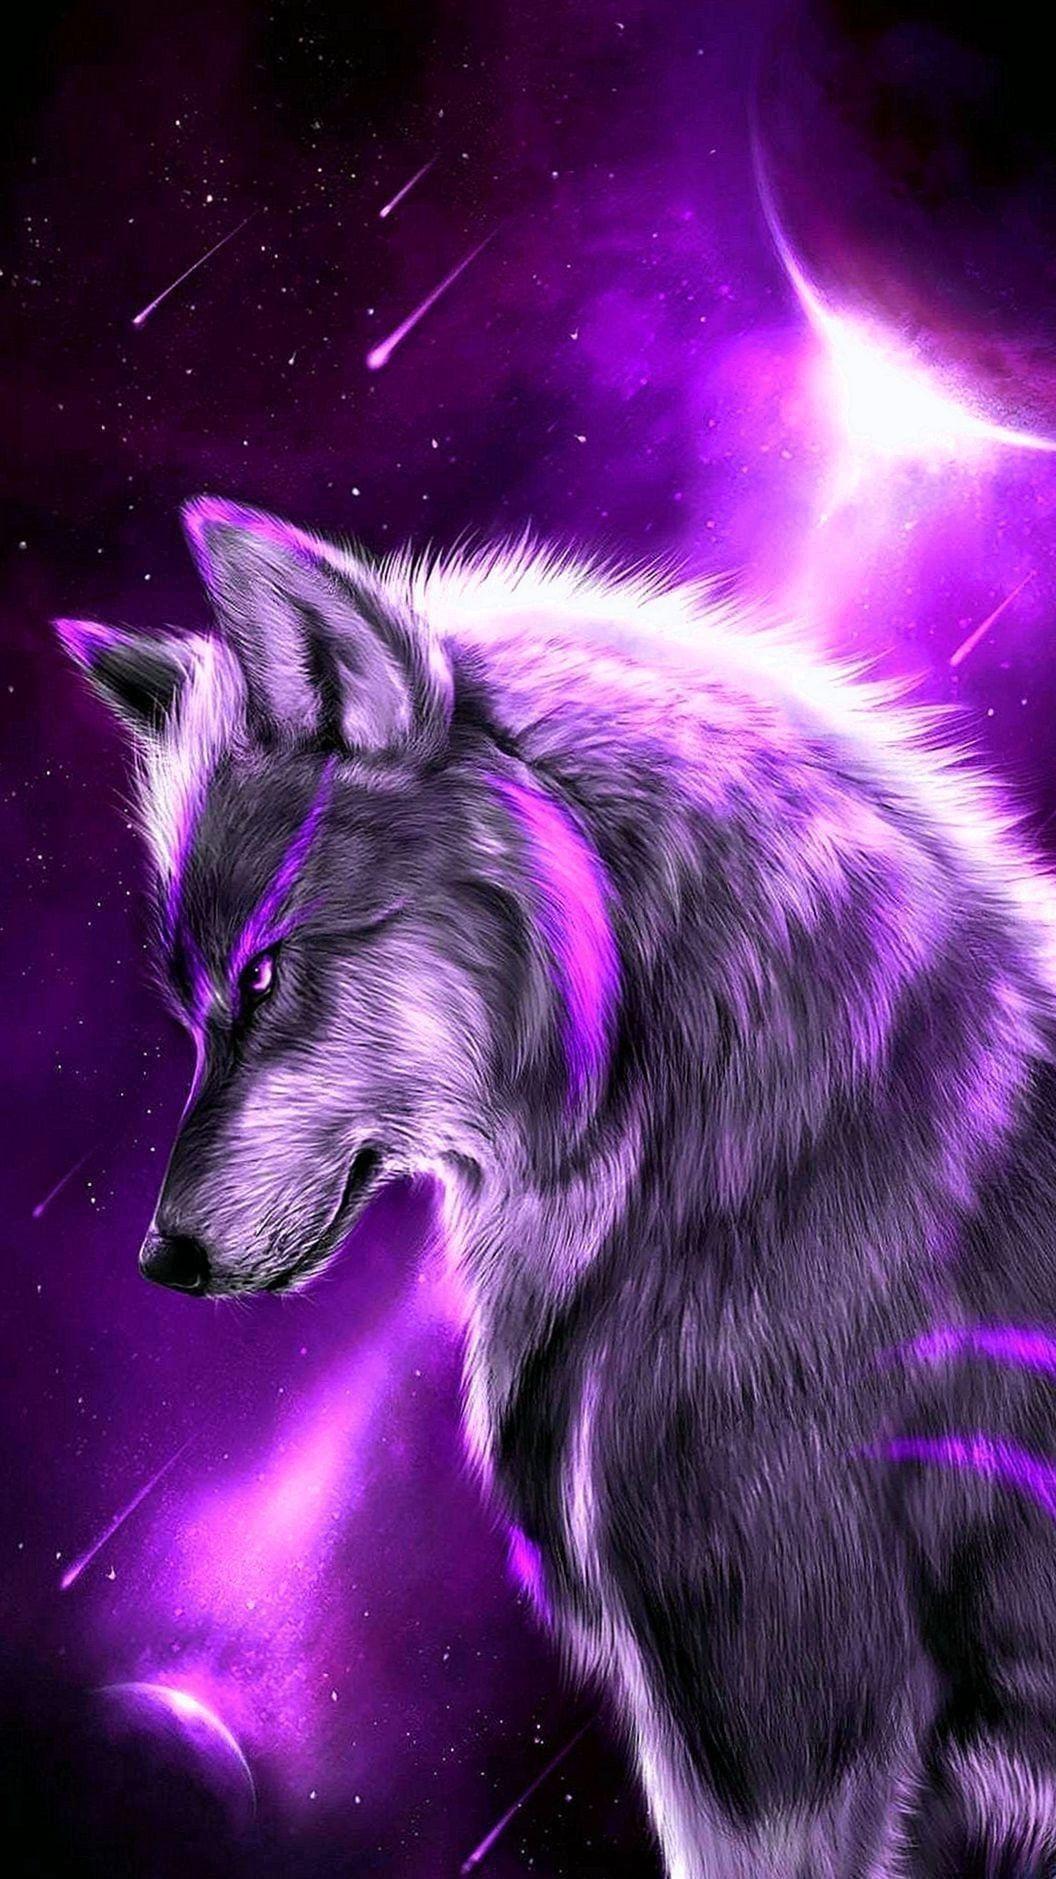 Animated Wolf Gif Wallpaper Http Wallpapersalbum Com Animated Wolf Gif Wallpaper Html In 2020 Wolf Painting Wolf Wallpaper Wolf Artwork